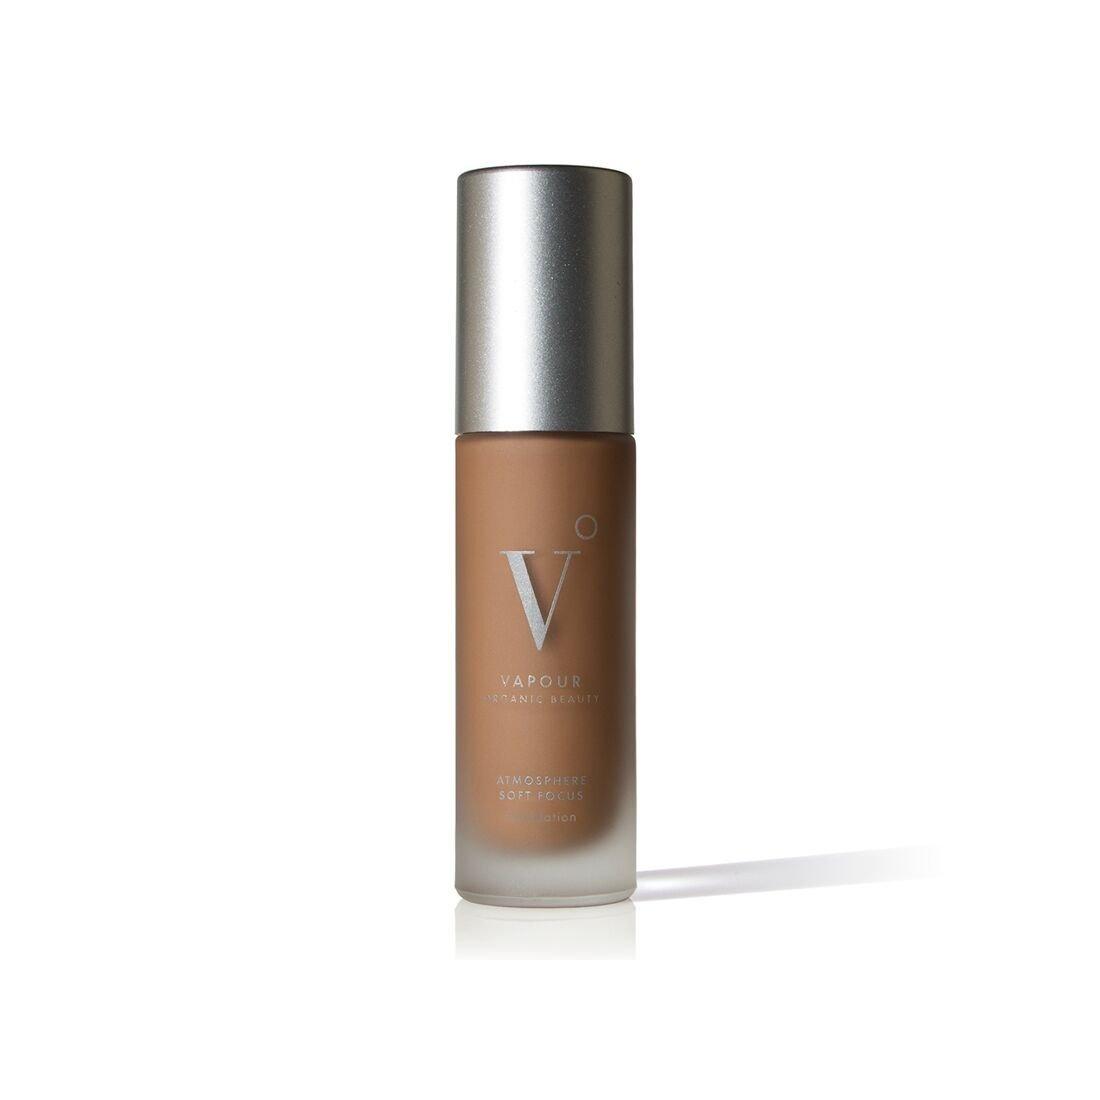 Vapour Organic Beauty Atmosphere Soft Focus Foundation, S140 Medium Dark, 1.14 Ounce